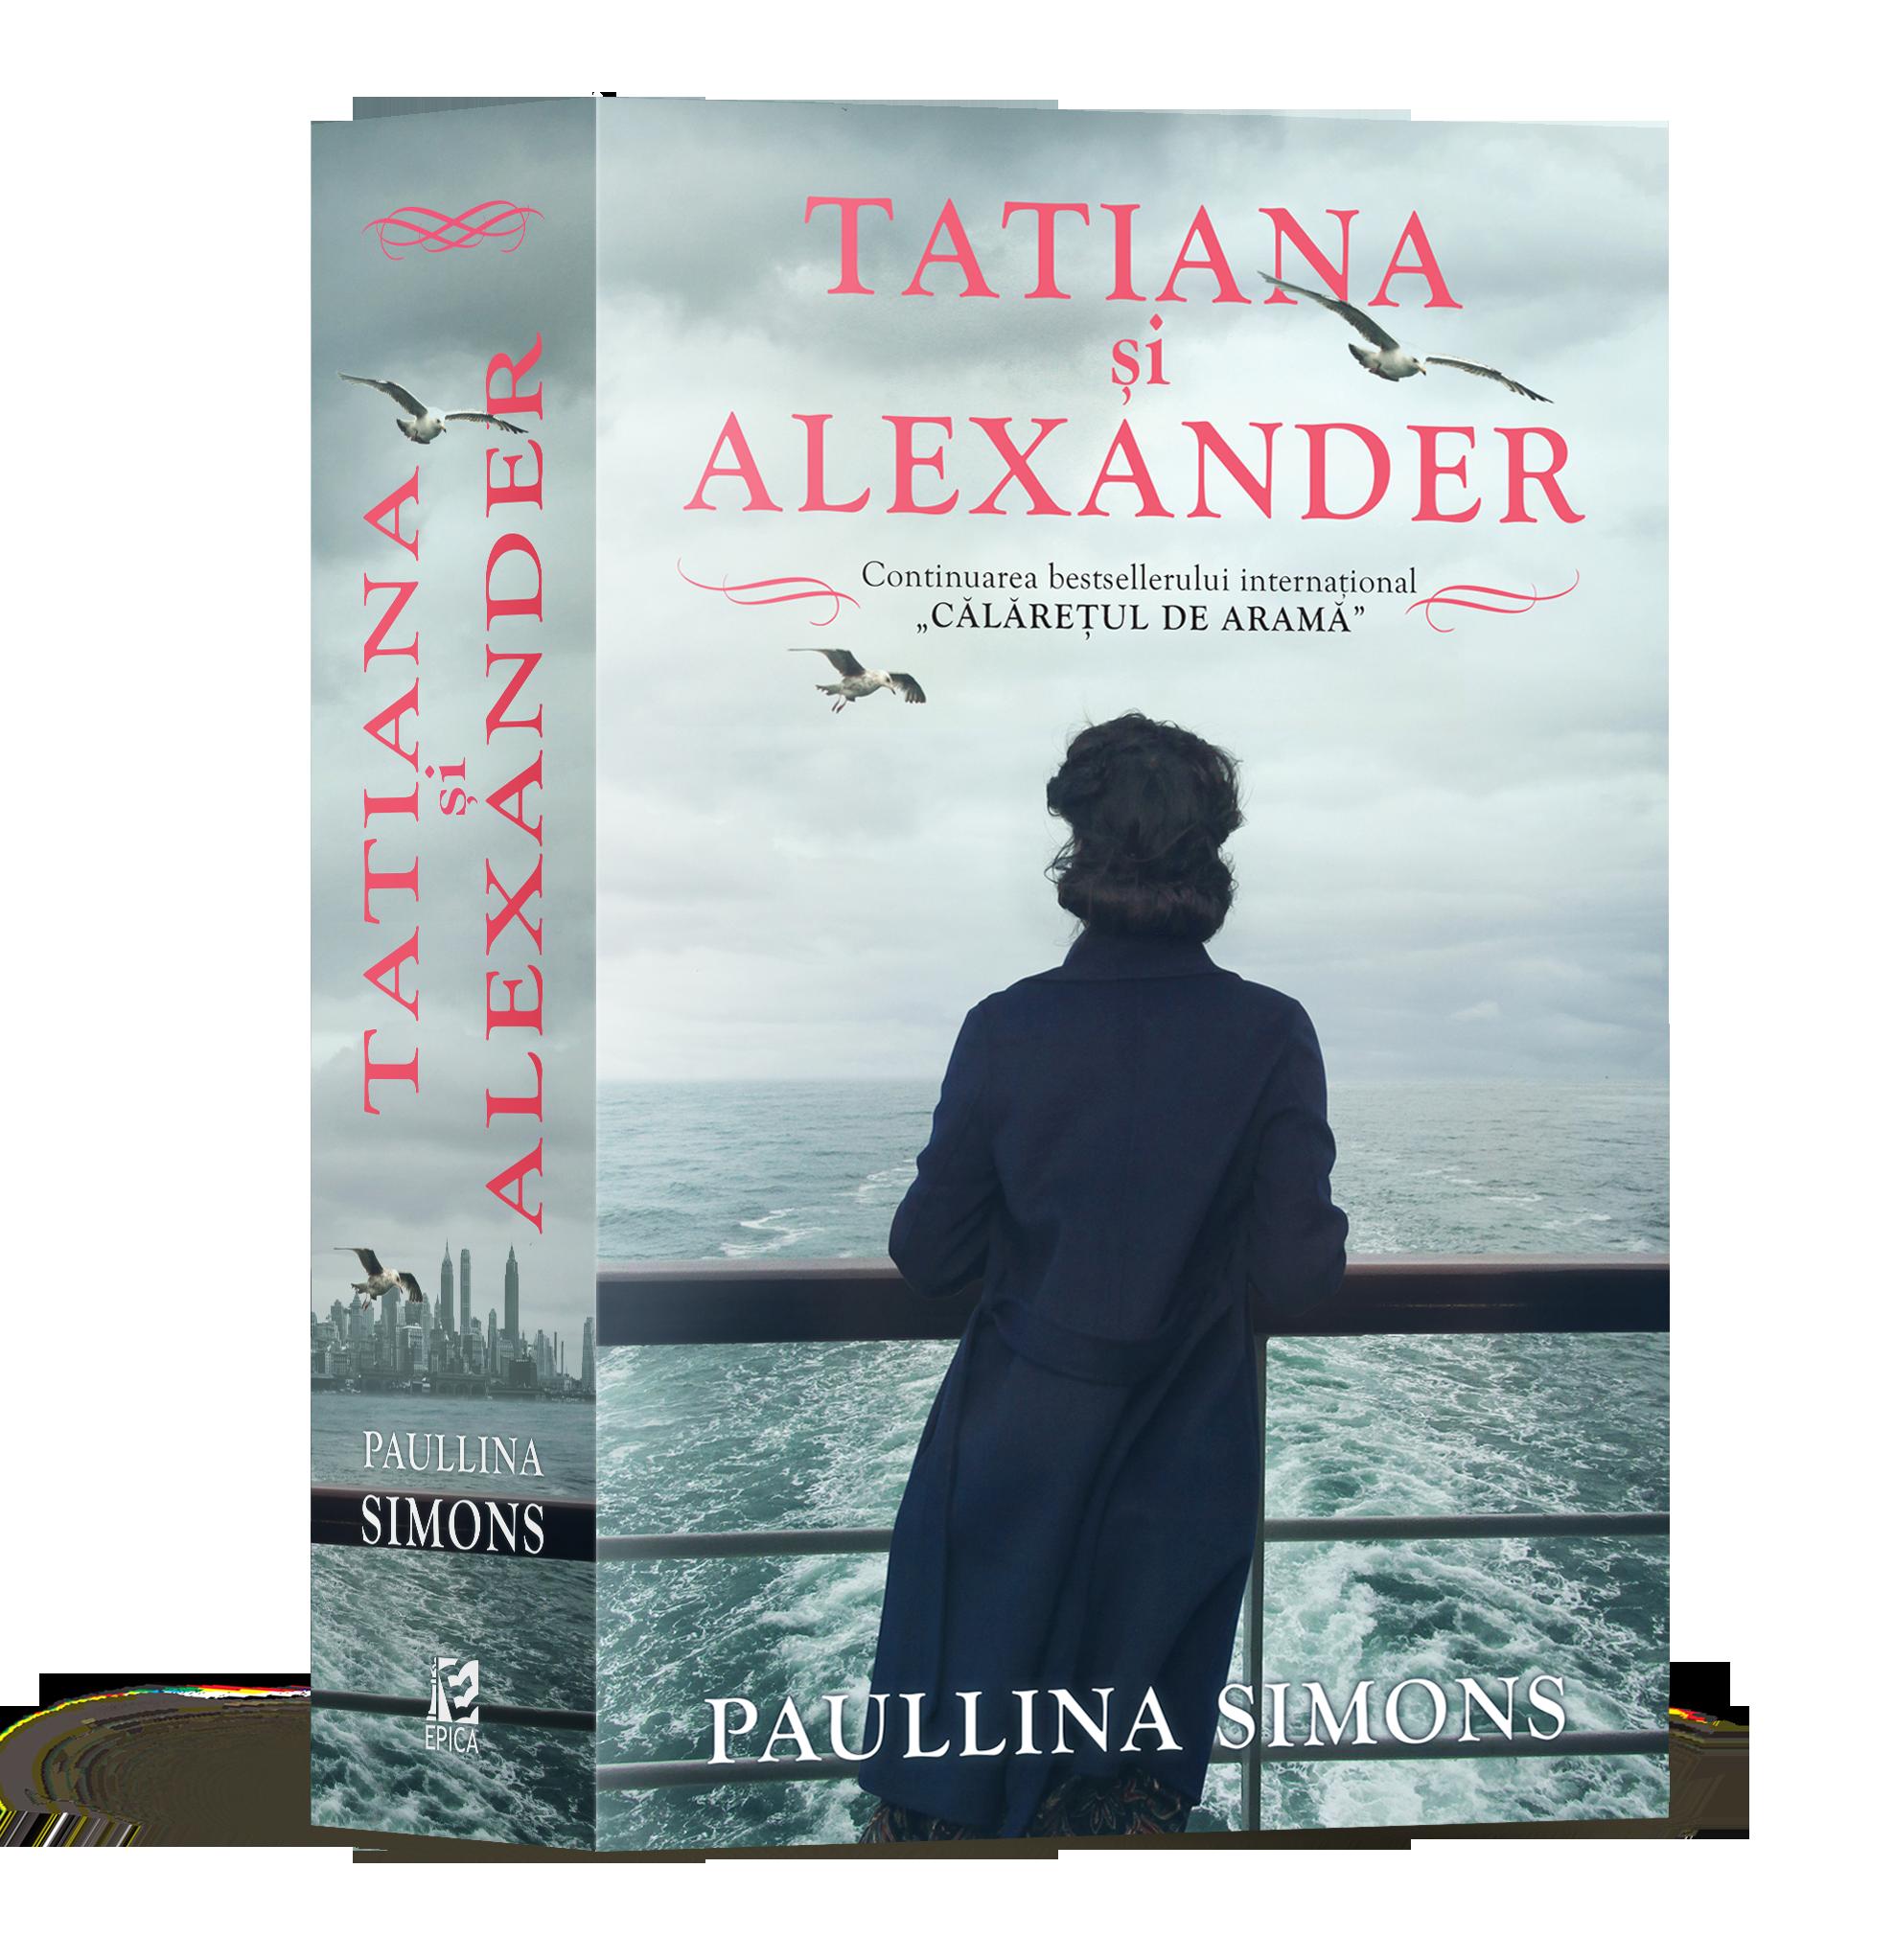 Tatiana&Alexander